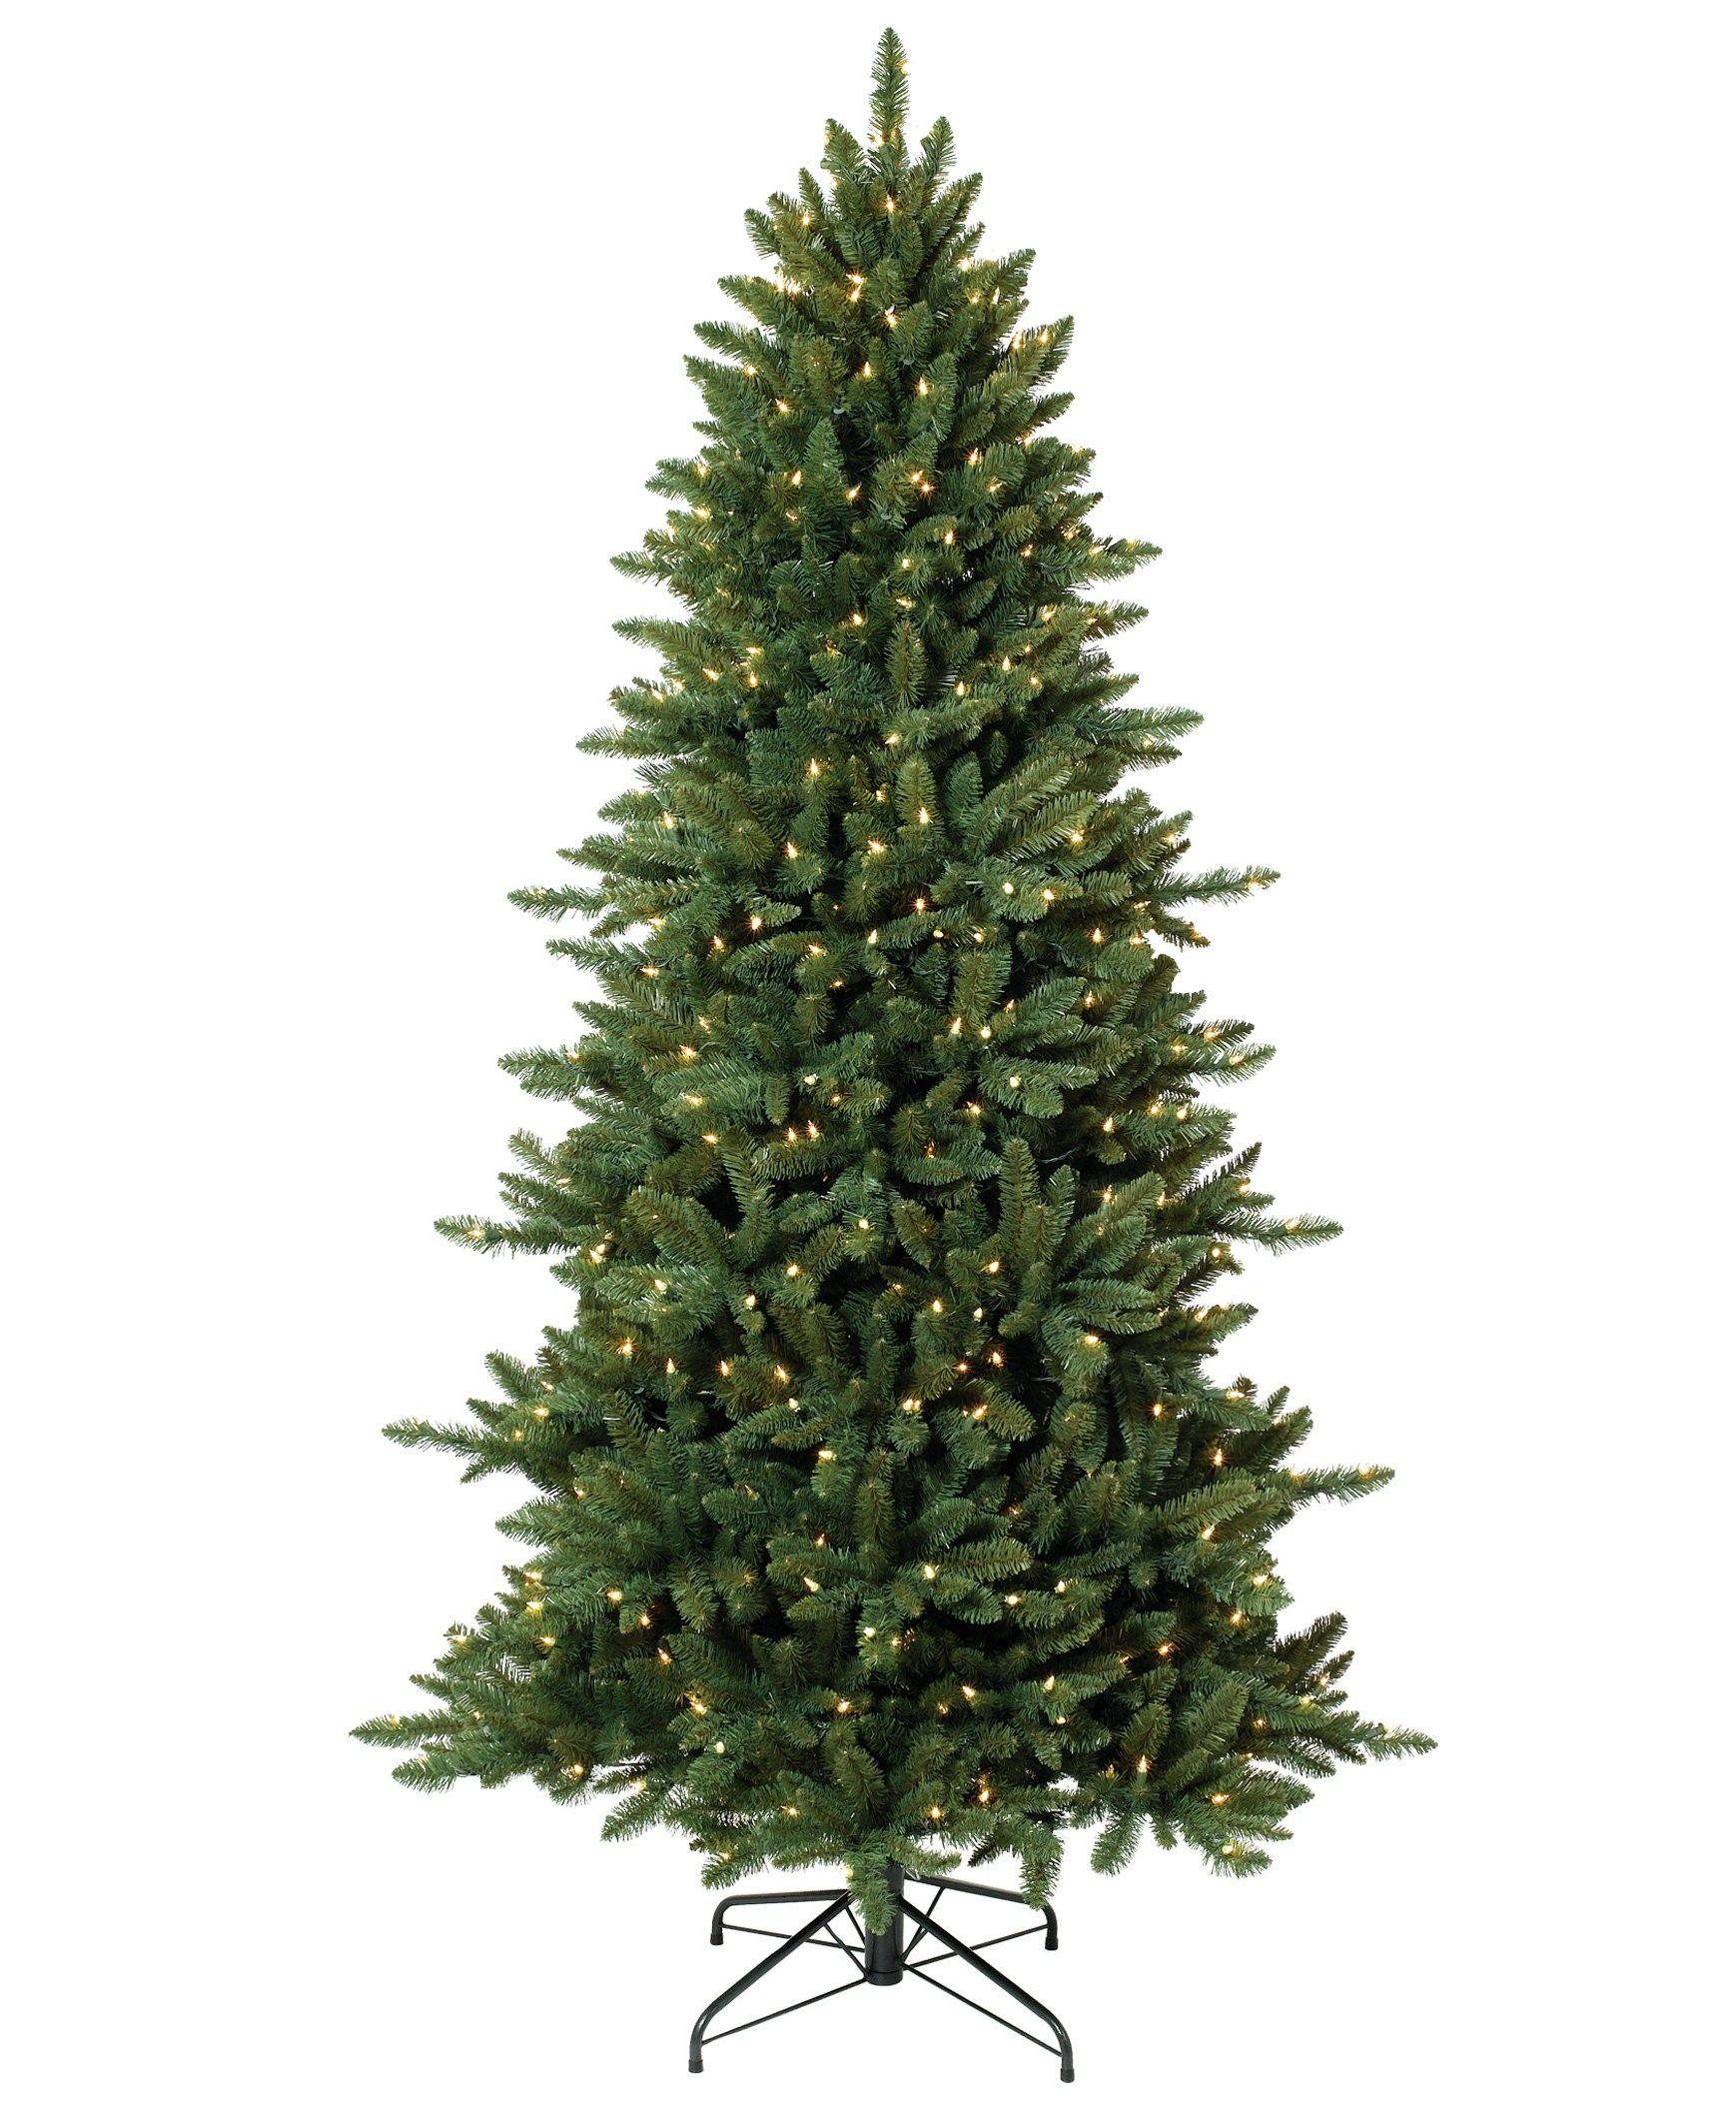 pine crest slim spruce artificial christmas tree 7ft unlit sale for 170 - 7ft Slim Christmas Tree